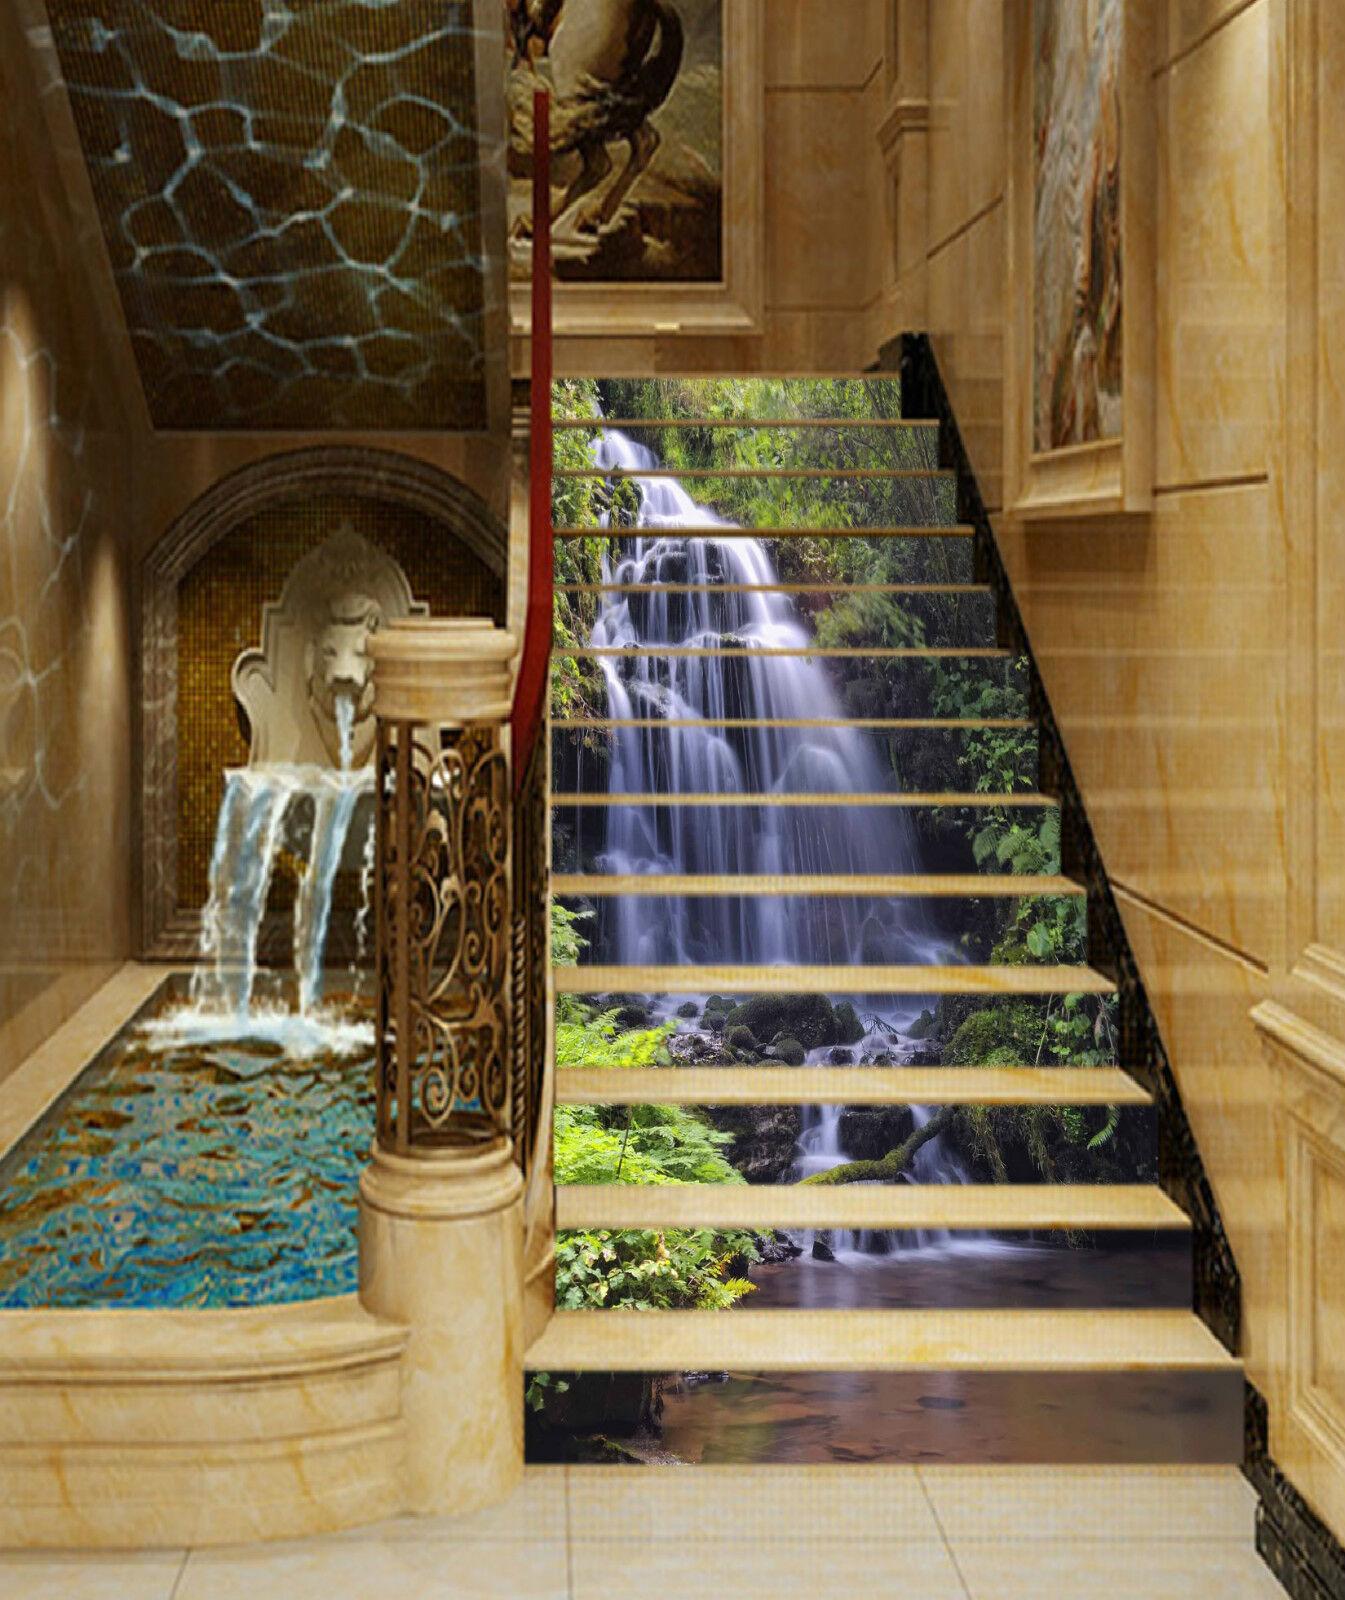 3D Wasserfall 3191 Stair Risers Dekoration Fototapete Vinyl Aufkleber Tapete DE